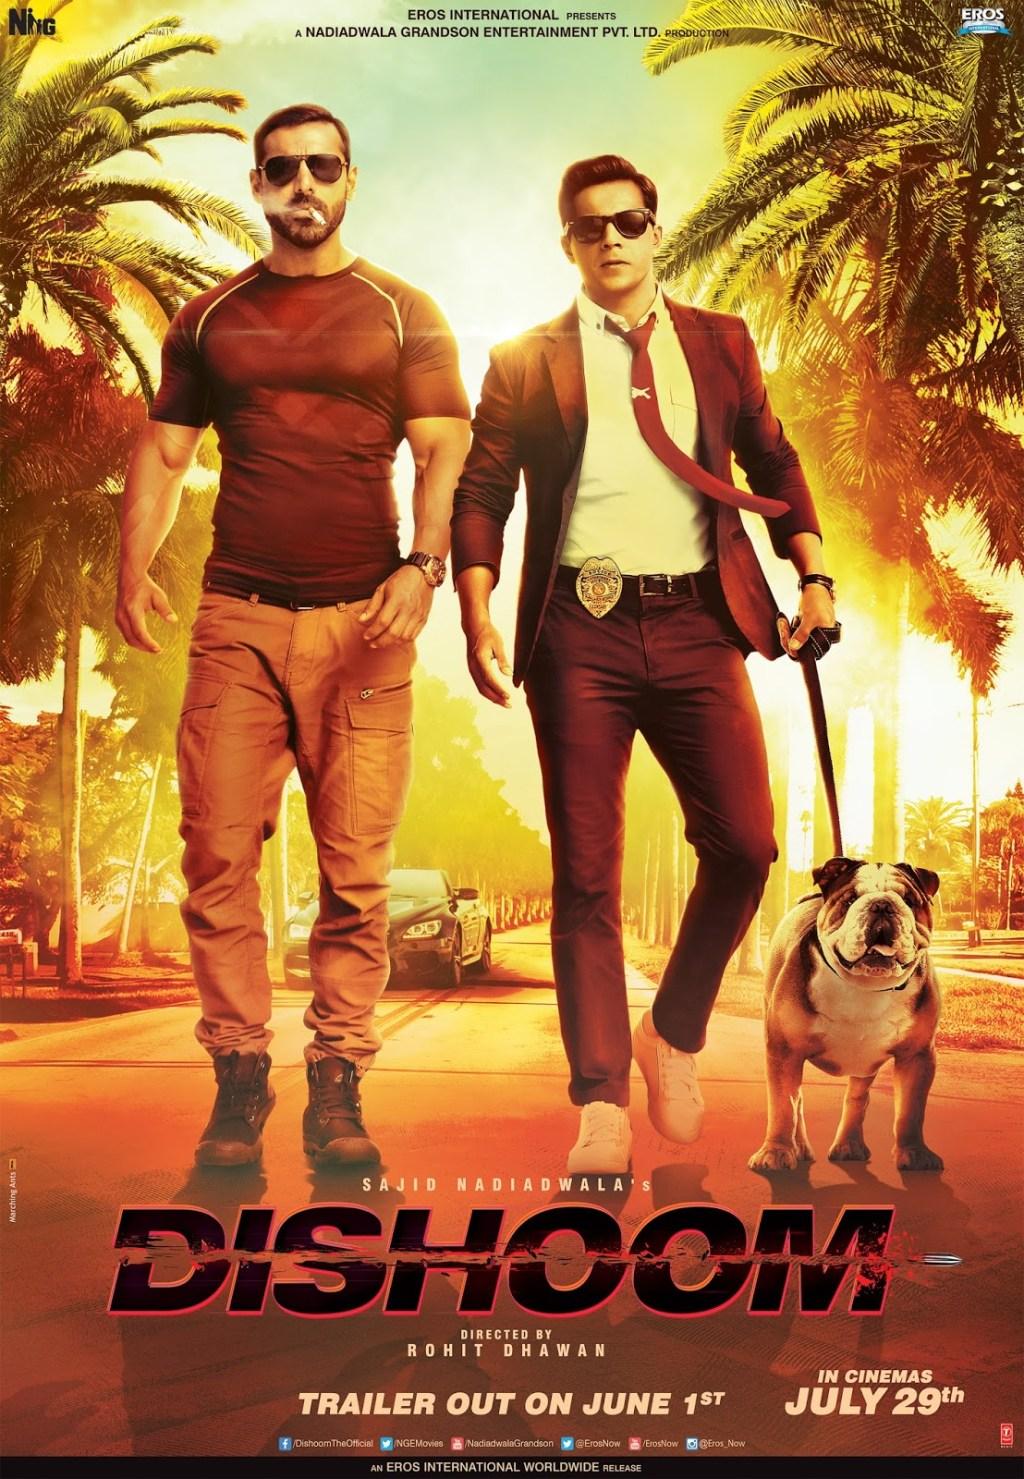 Dishoom Movie Poster John Abraham Varun Dhawan